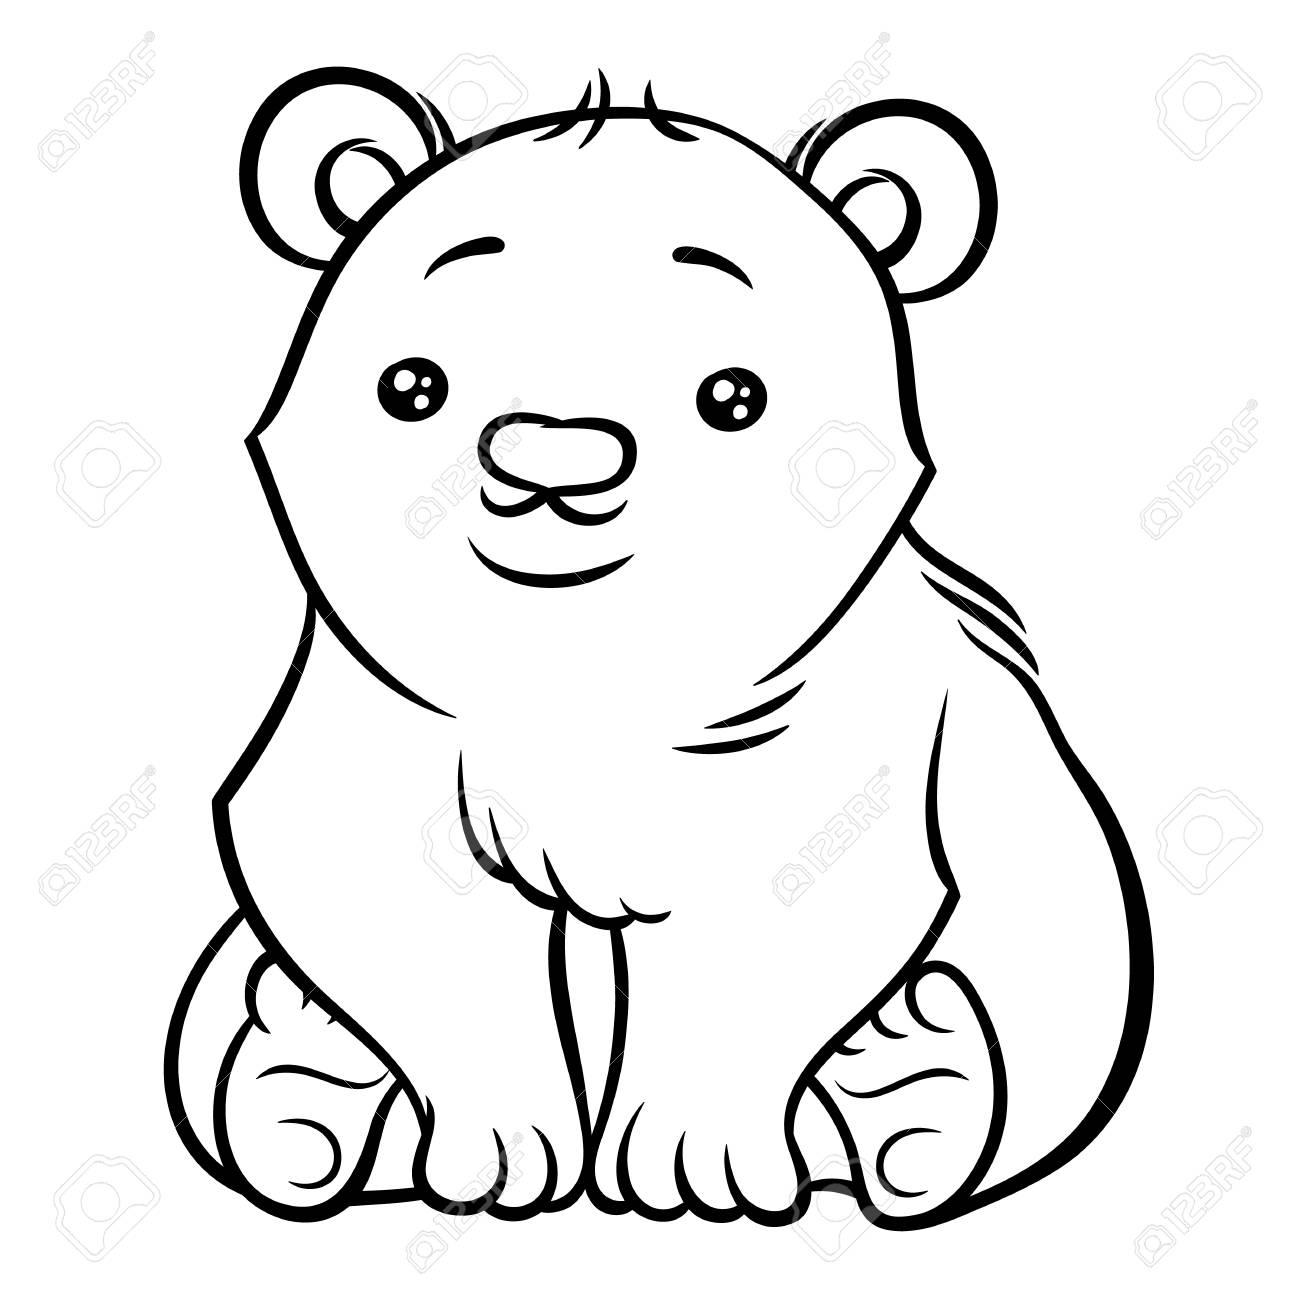 1300x1300 Illustration Of Cute Cartoon Baby Polar Bear Royalty Free Cliparts